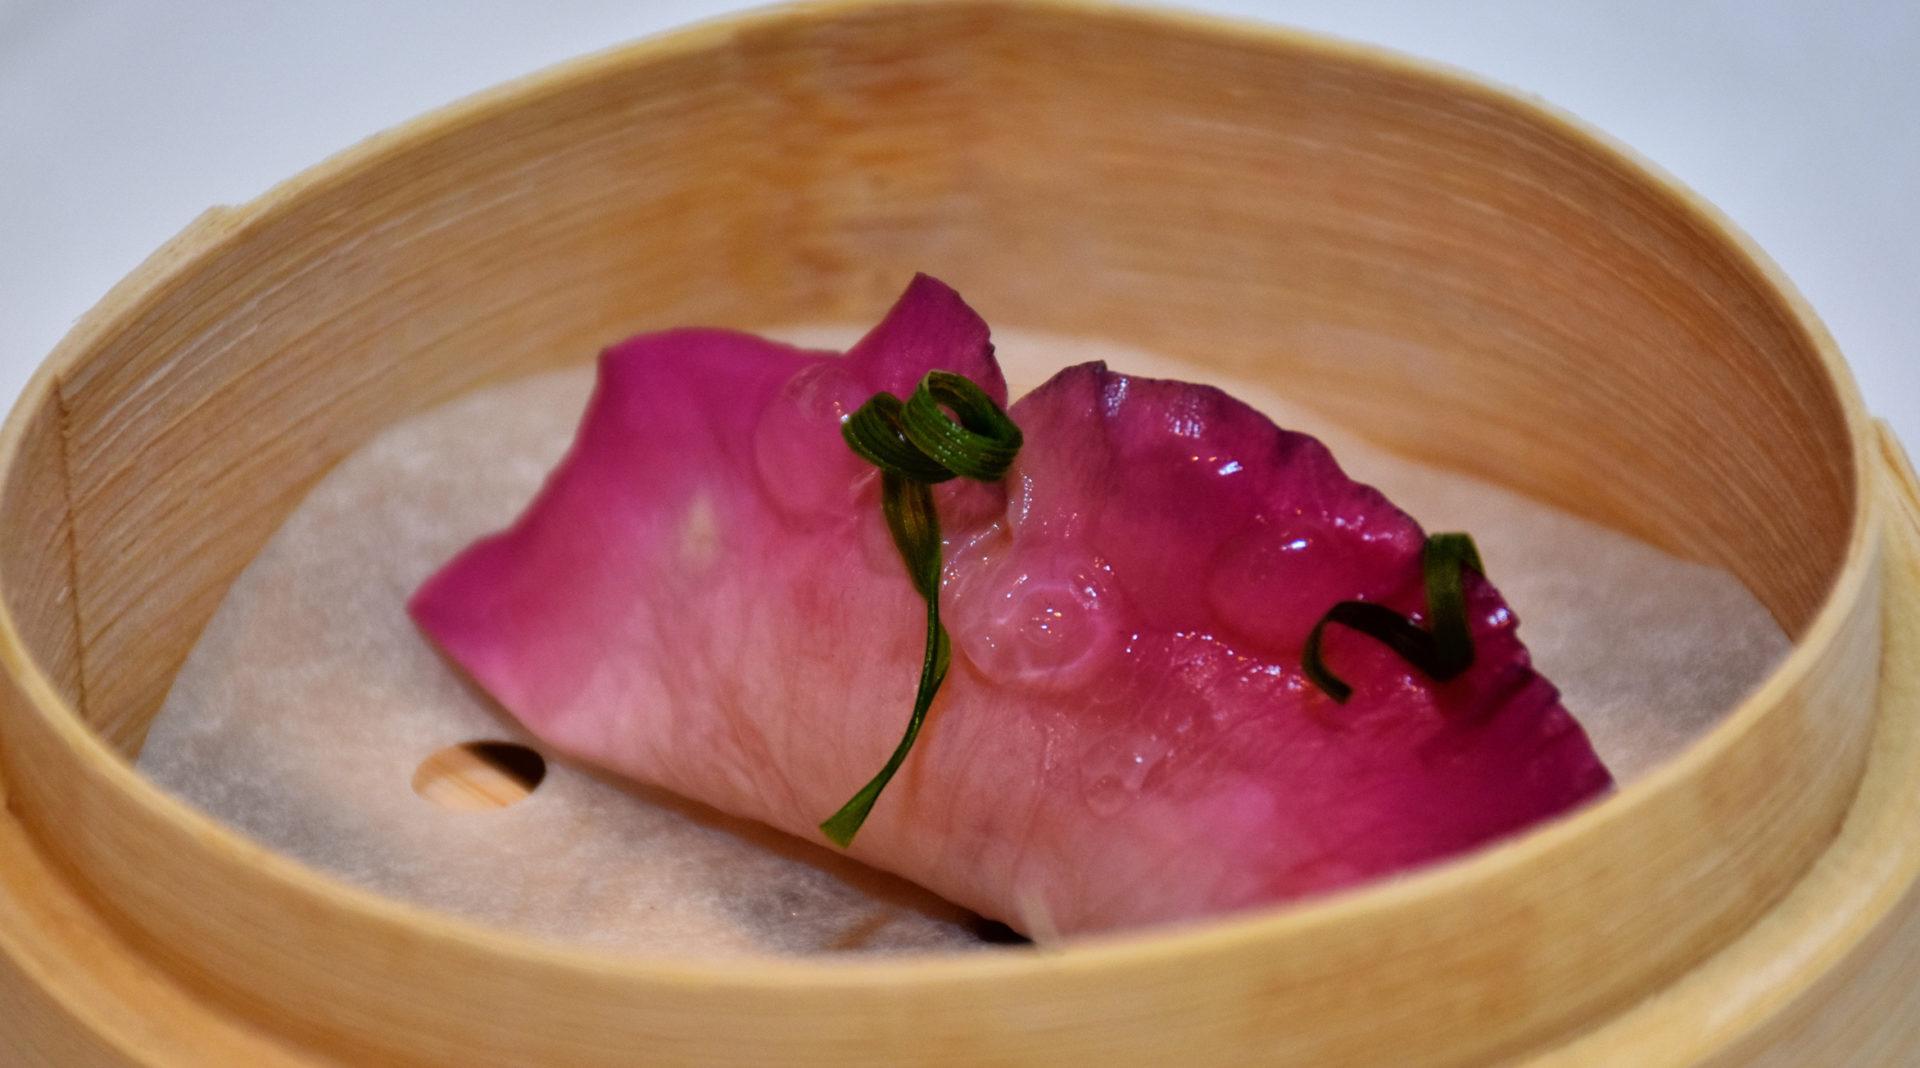 Picture of roses and Shrimp dumpling Hong Kong menu BBVA Celler Tour 2016